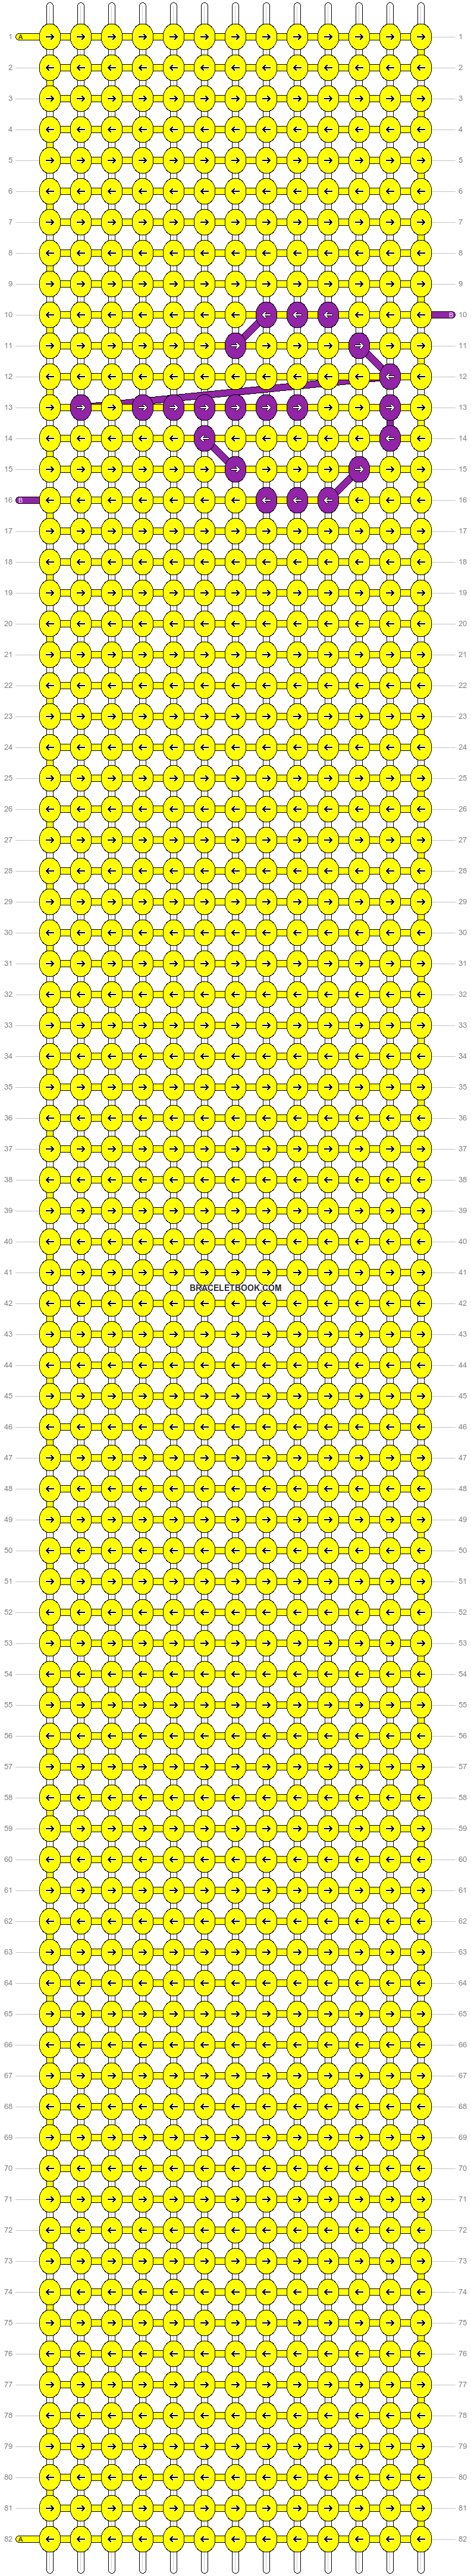 Alpha pattern #14455 pattern